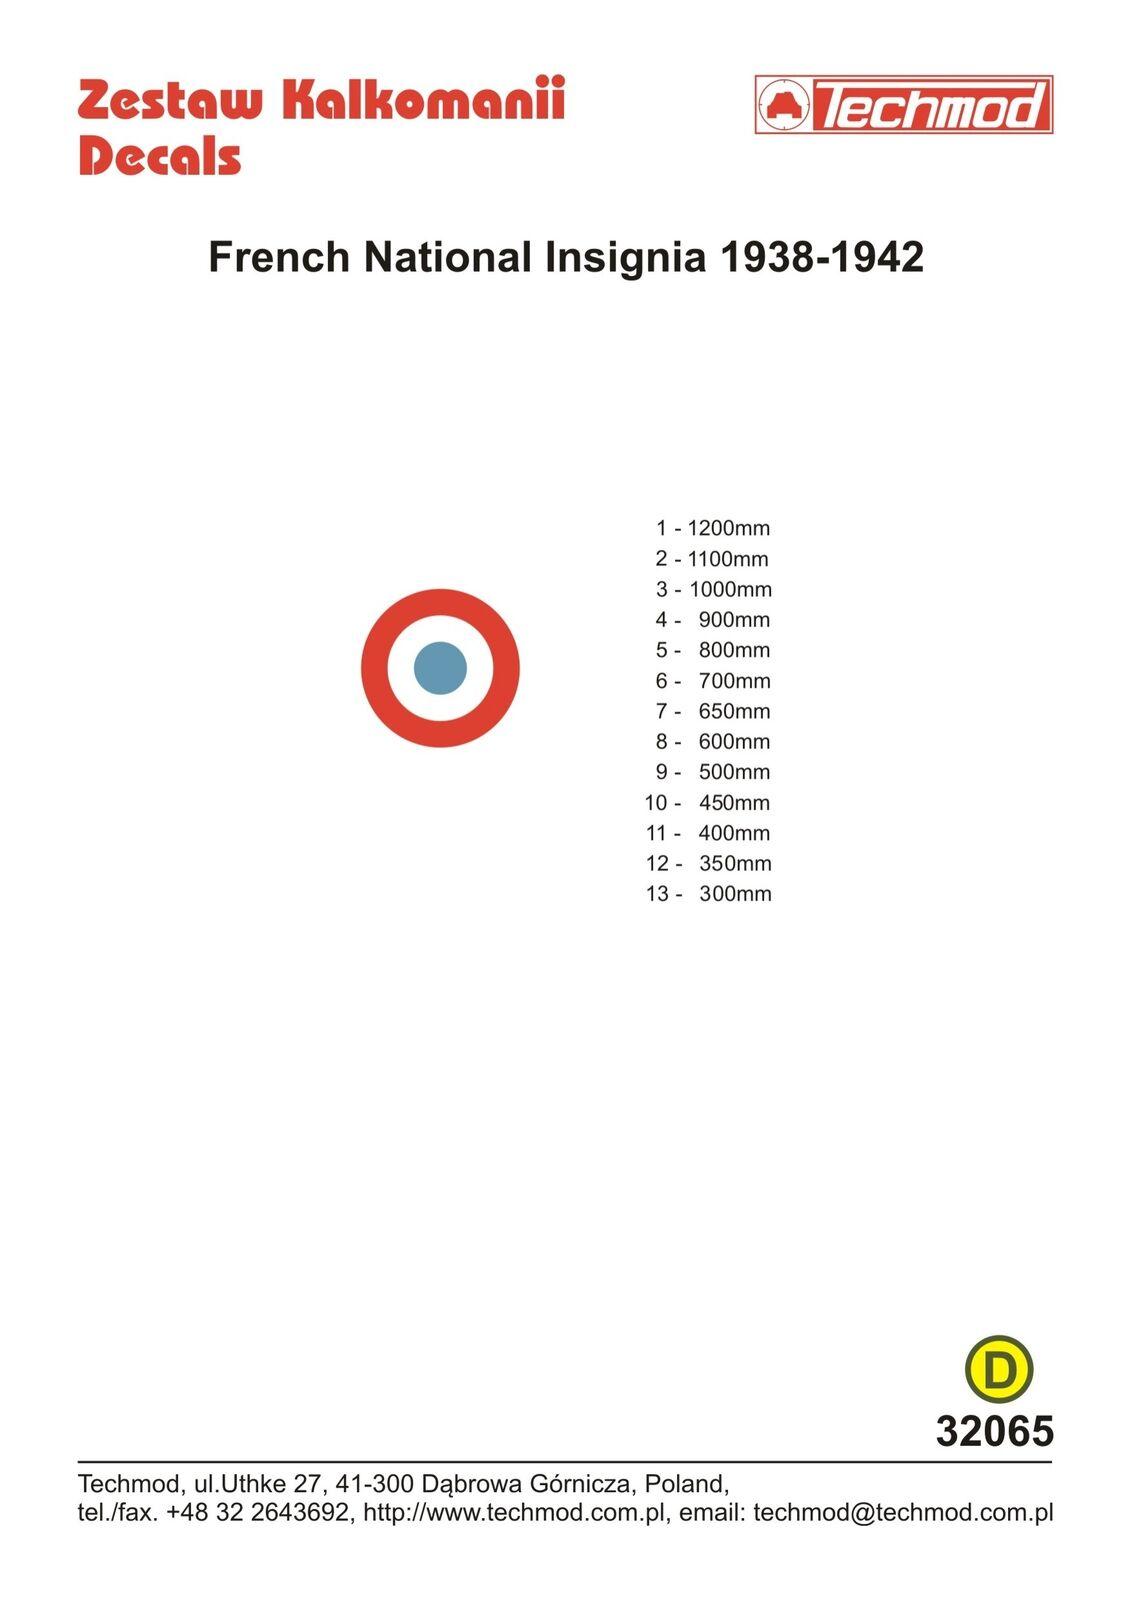 TECHMOD 1 32 FRANCESE NAZIONALE insegne 1938-1942